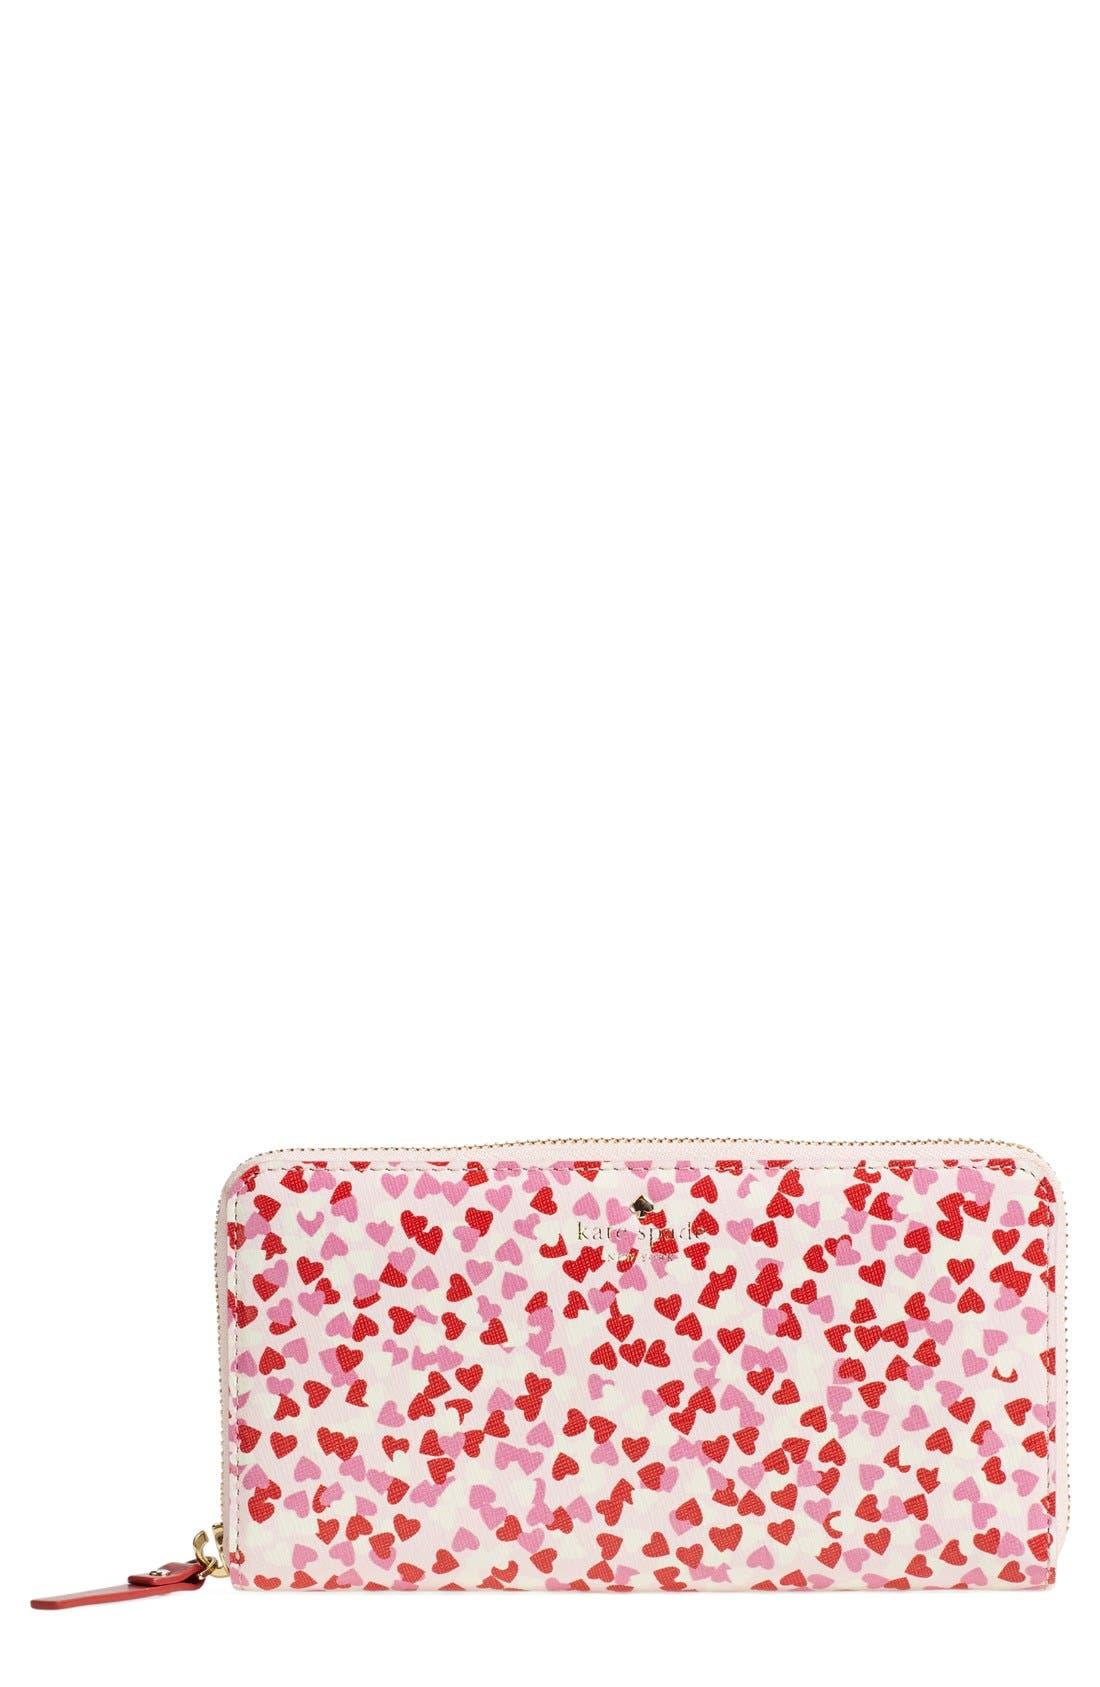 Main Image - kate spade new york 'confetti print lacey' zip around wallet